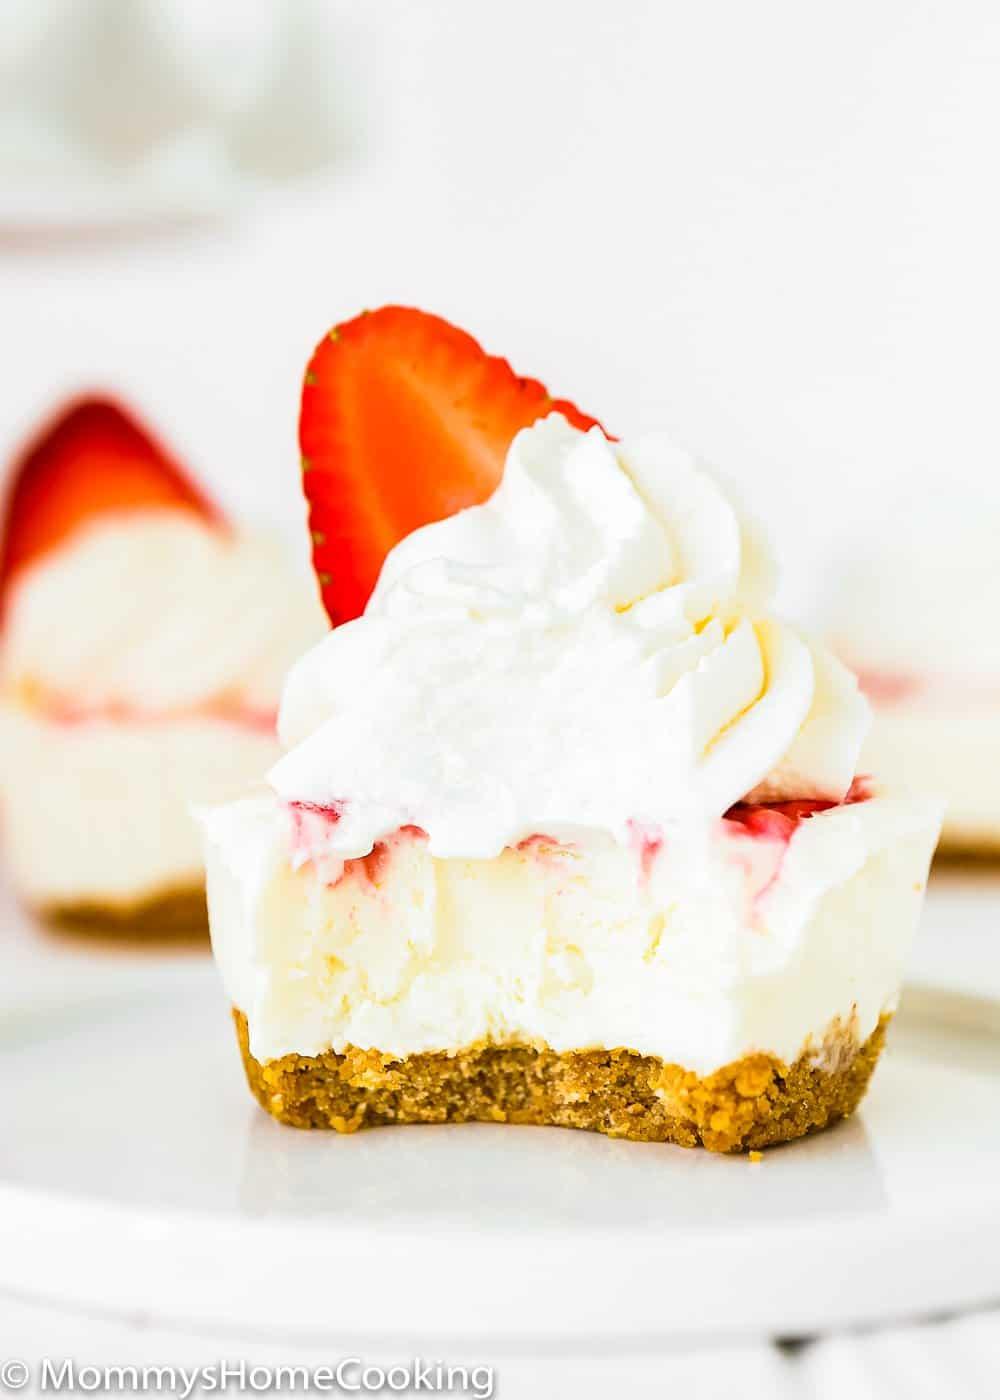 Mini Greek Yogurt Strawberry Cheesecake bitten